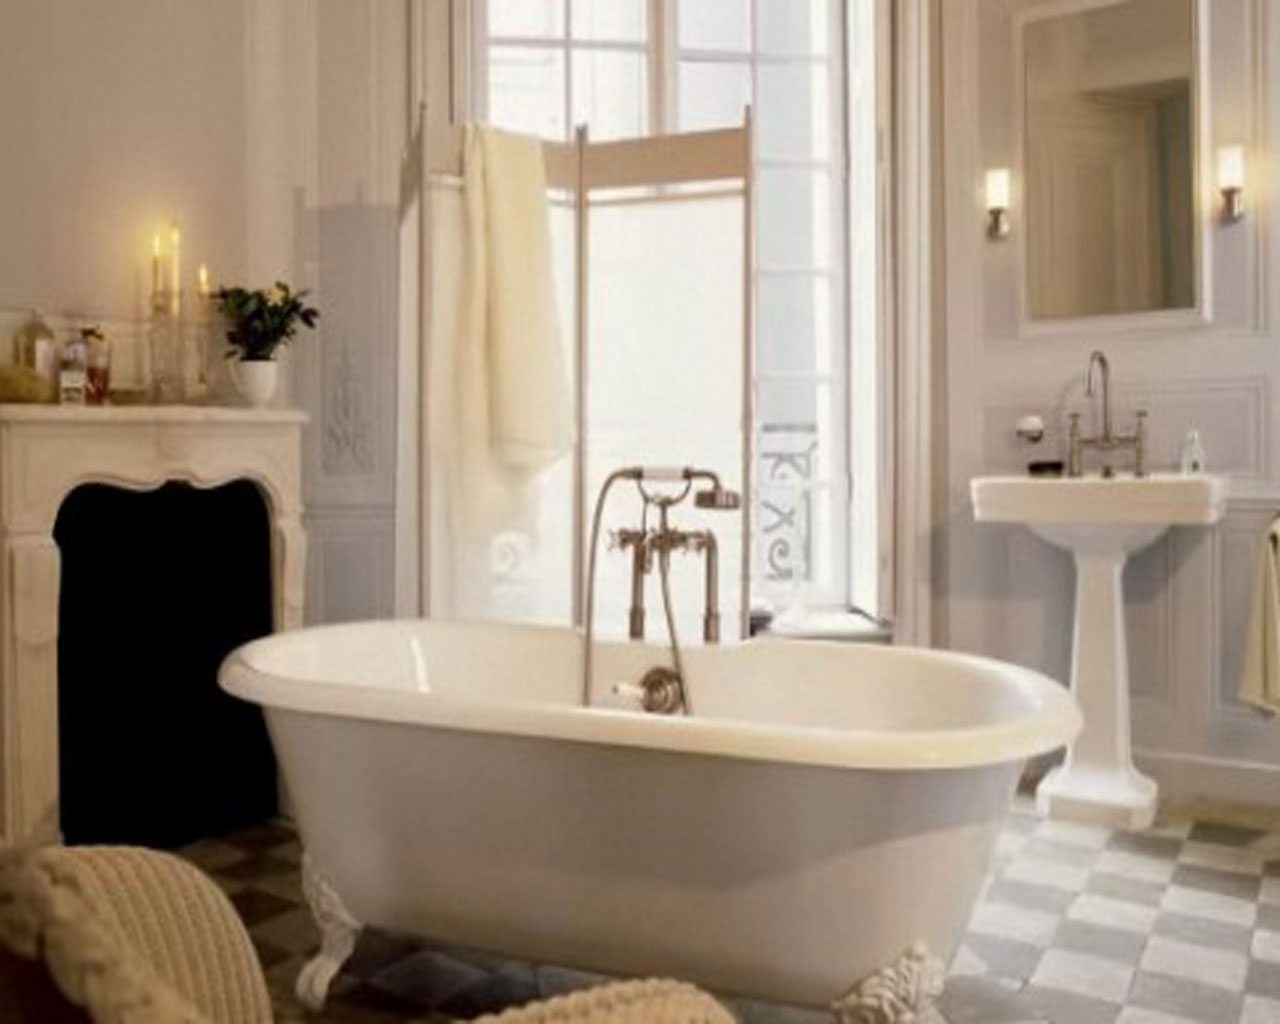 Modern Bathroom Wallpaper Designs   Interiordecodircom 1280x1024